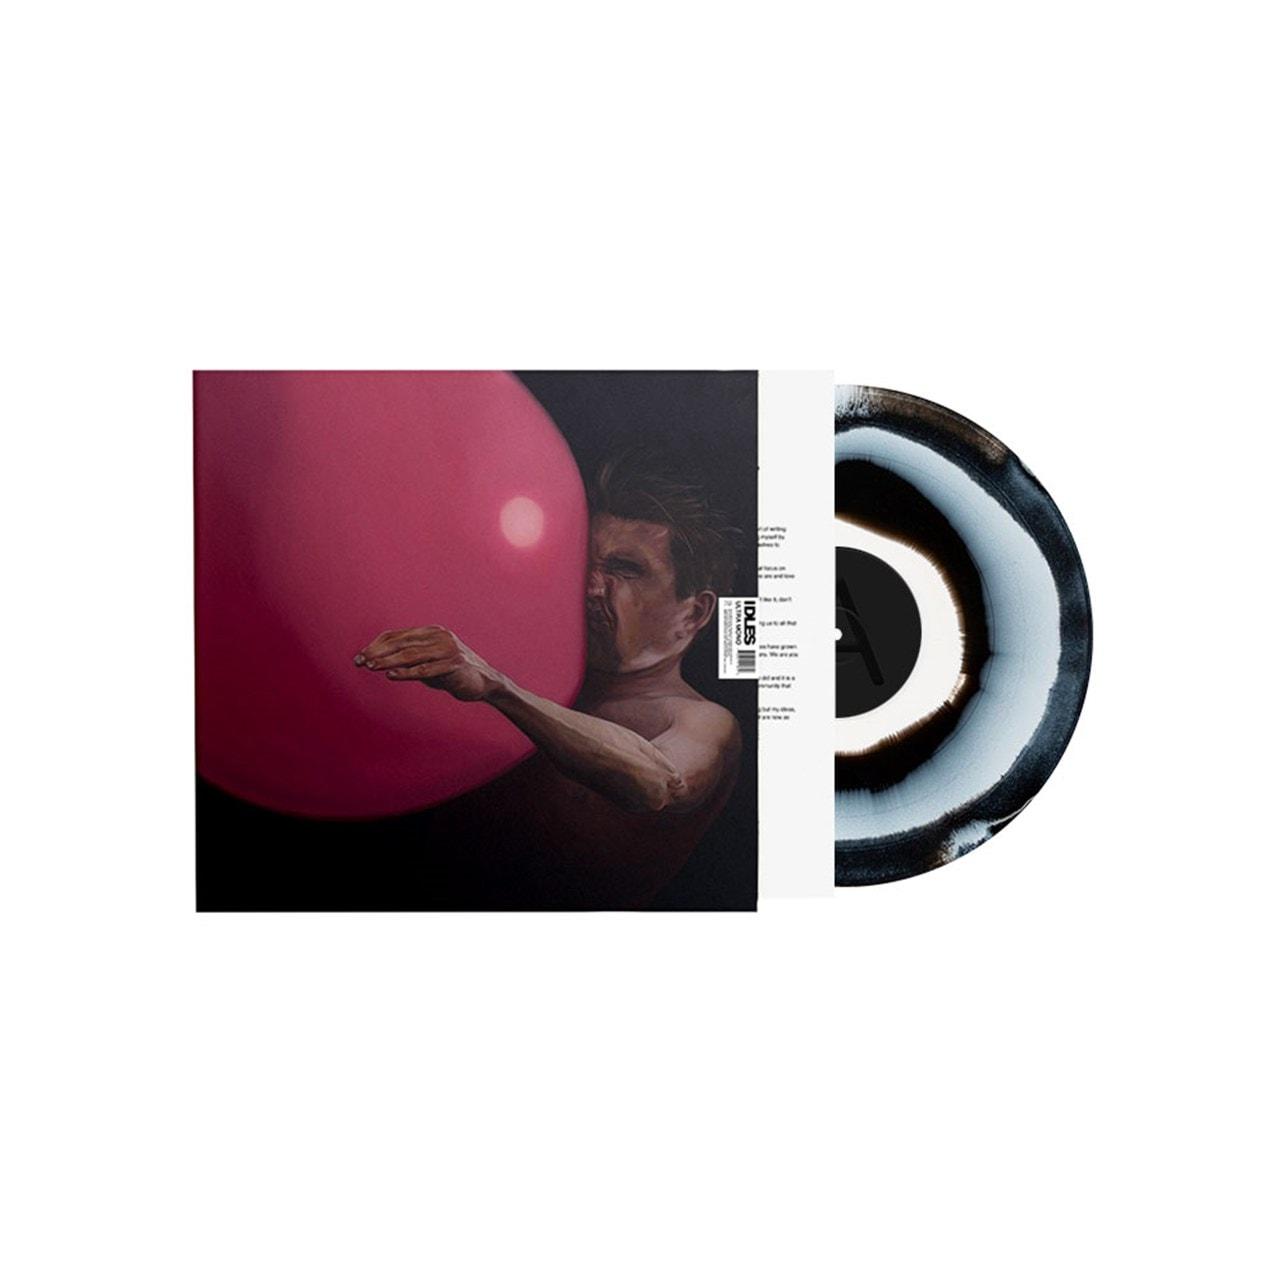 Ultra Mono: Signed Limited Edition Vortex Vinyl - 1